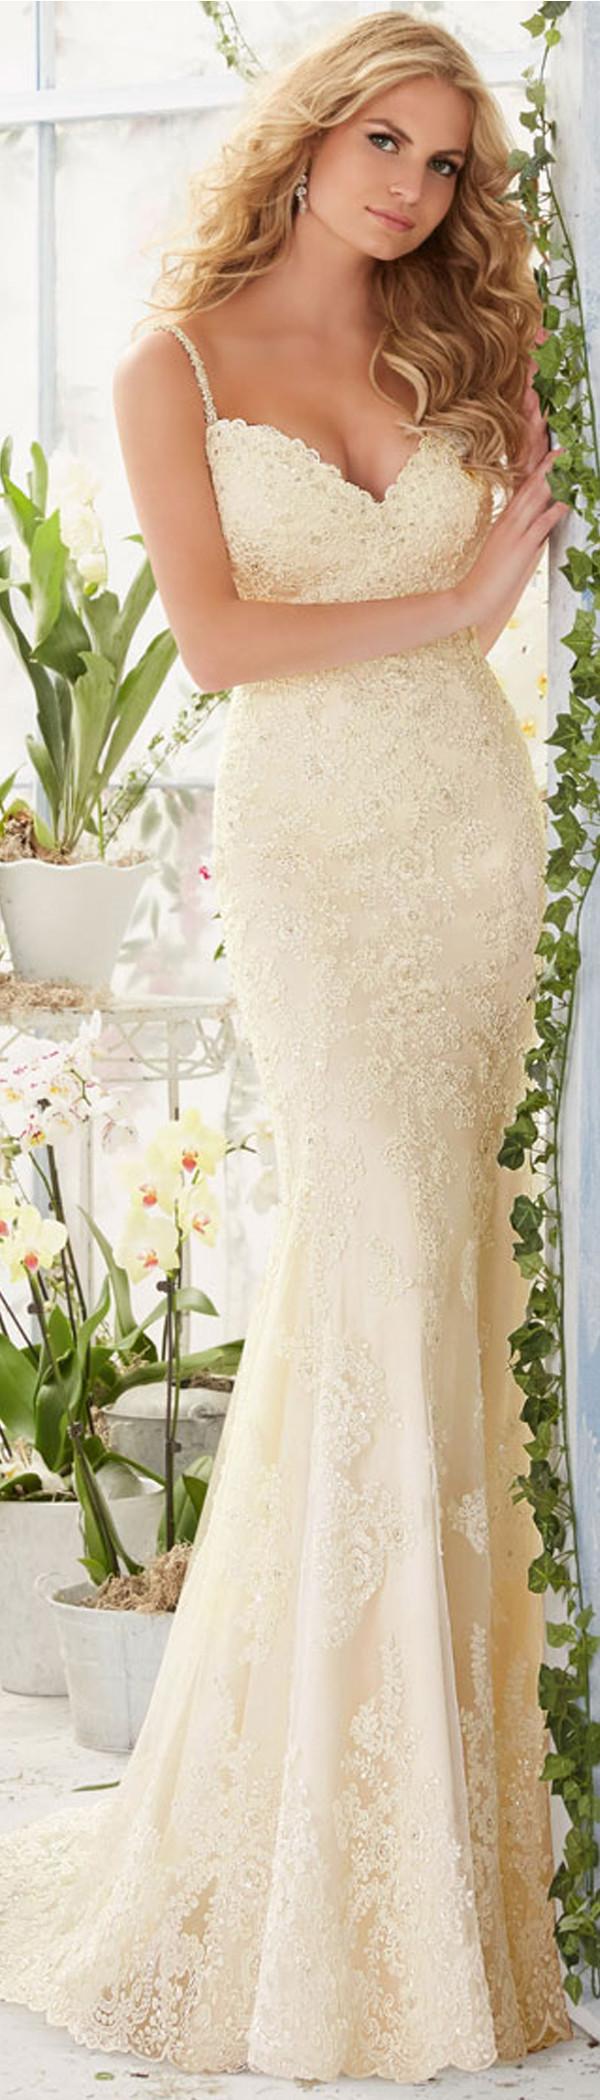 Beaded spaghetti strap wedding dresses  Elegant Tulle Spaghetti Straps Neckline Sheath Wedding Dresses with